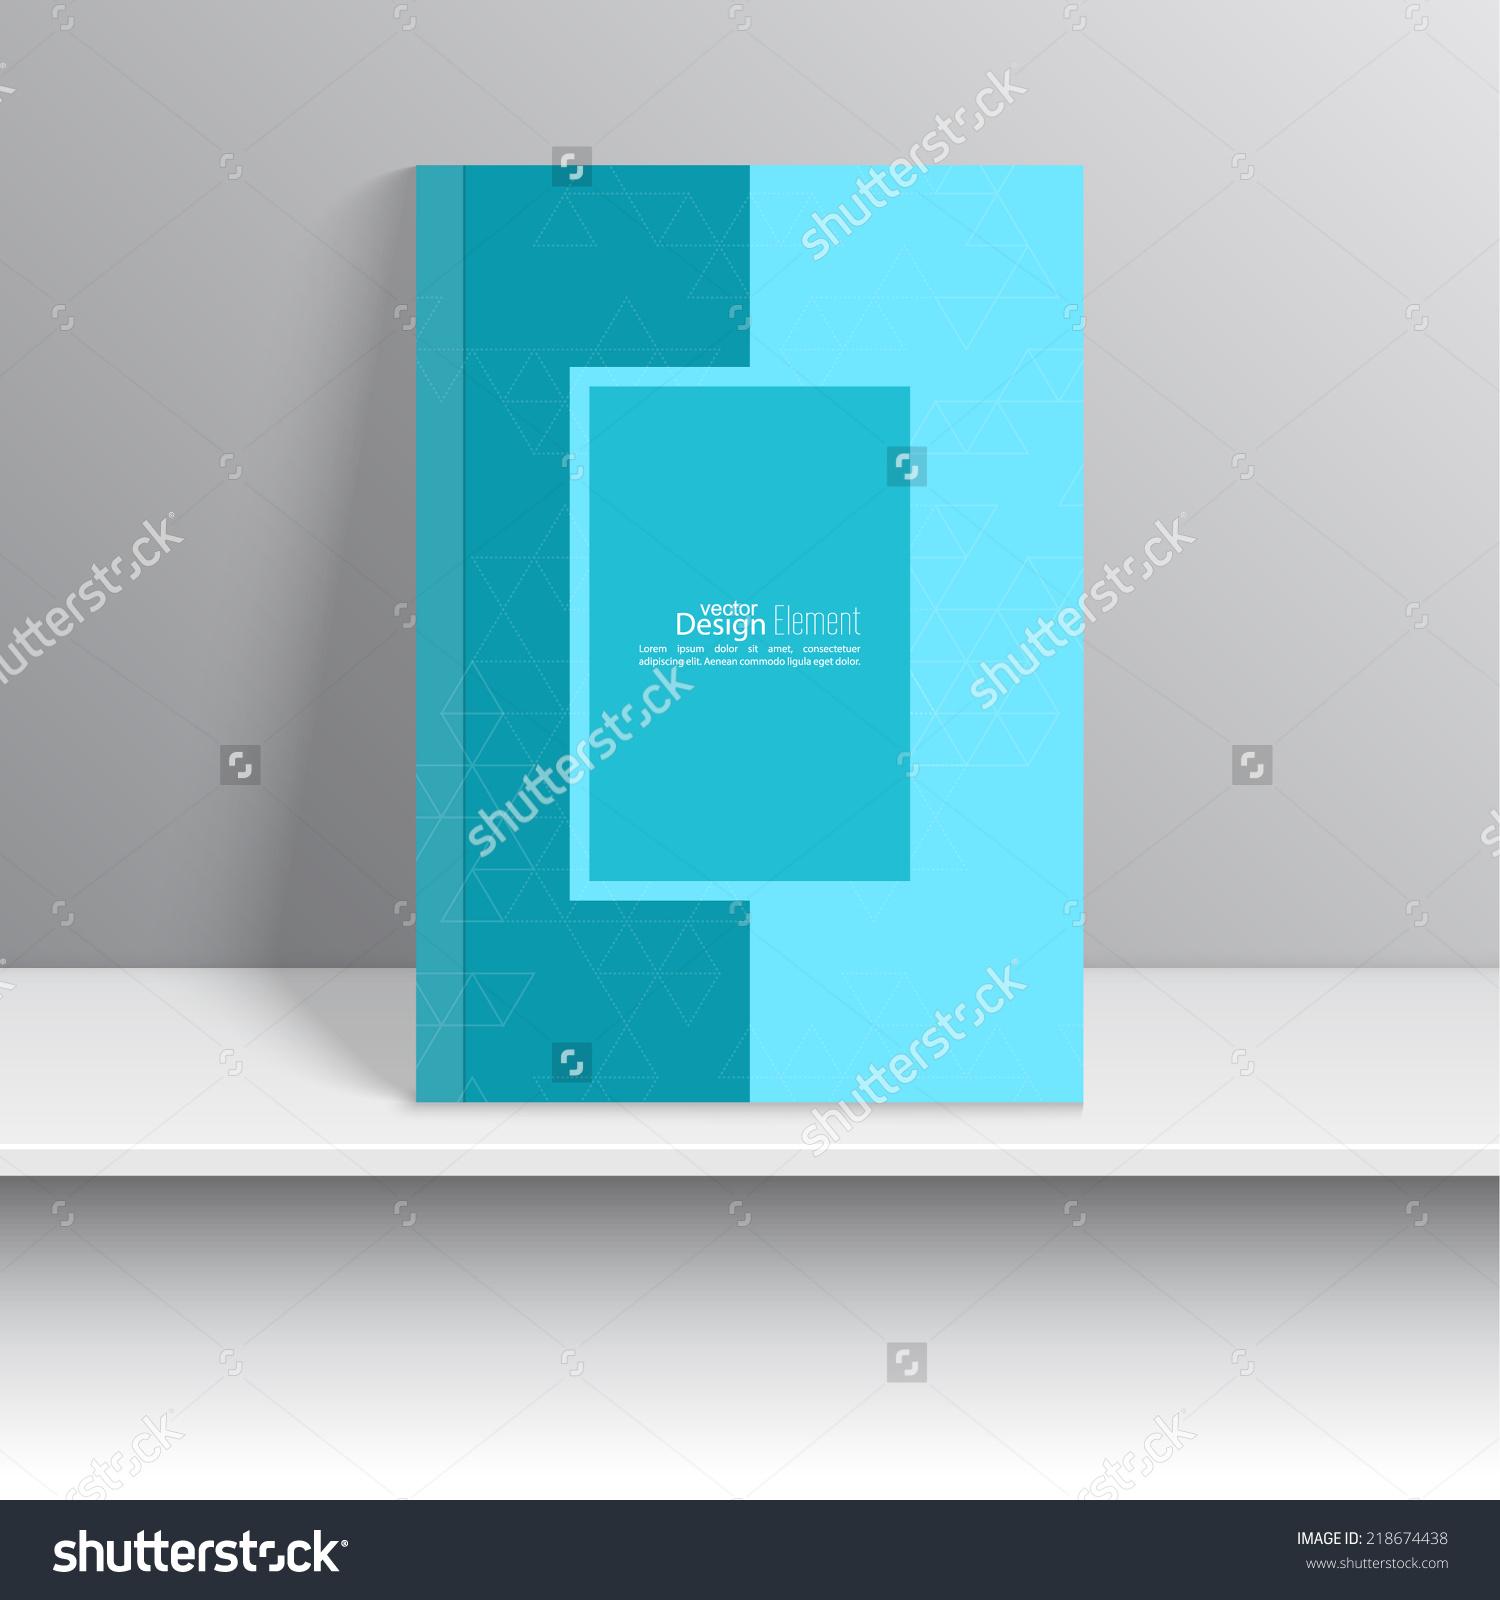 Interior Designs clipart magazine cover Story  Triangle Lightbox Homelk